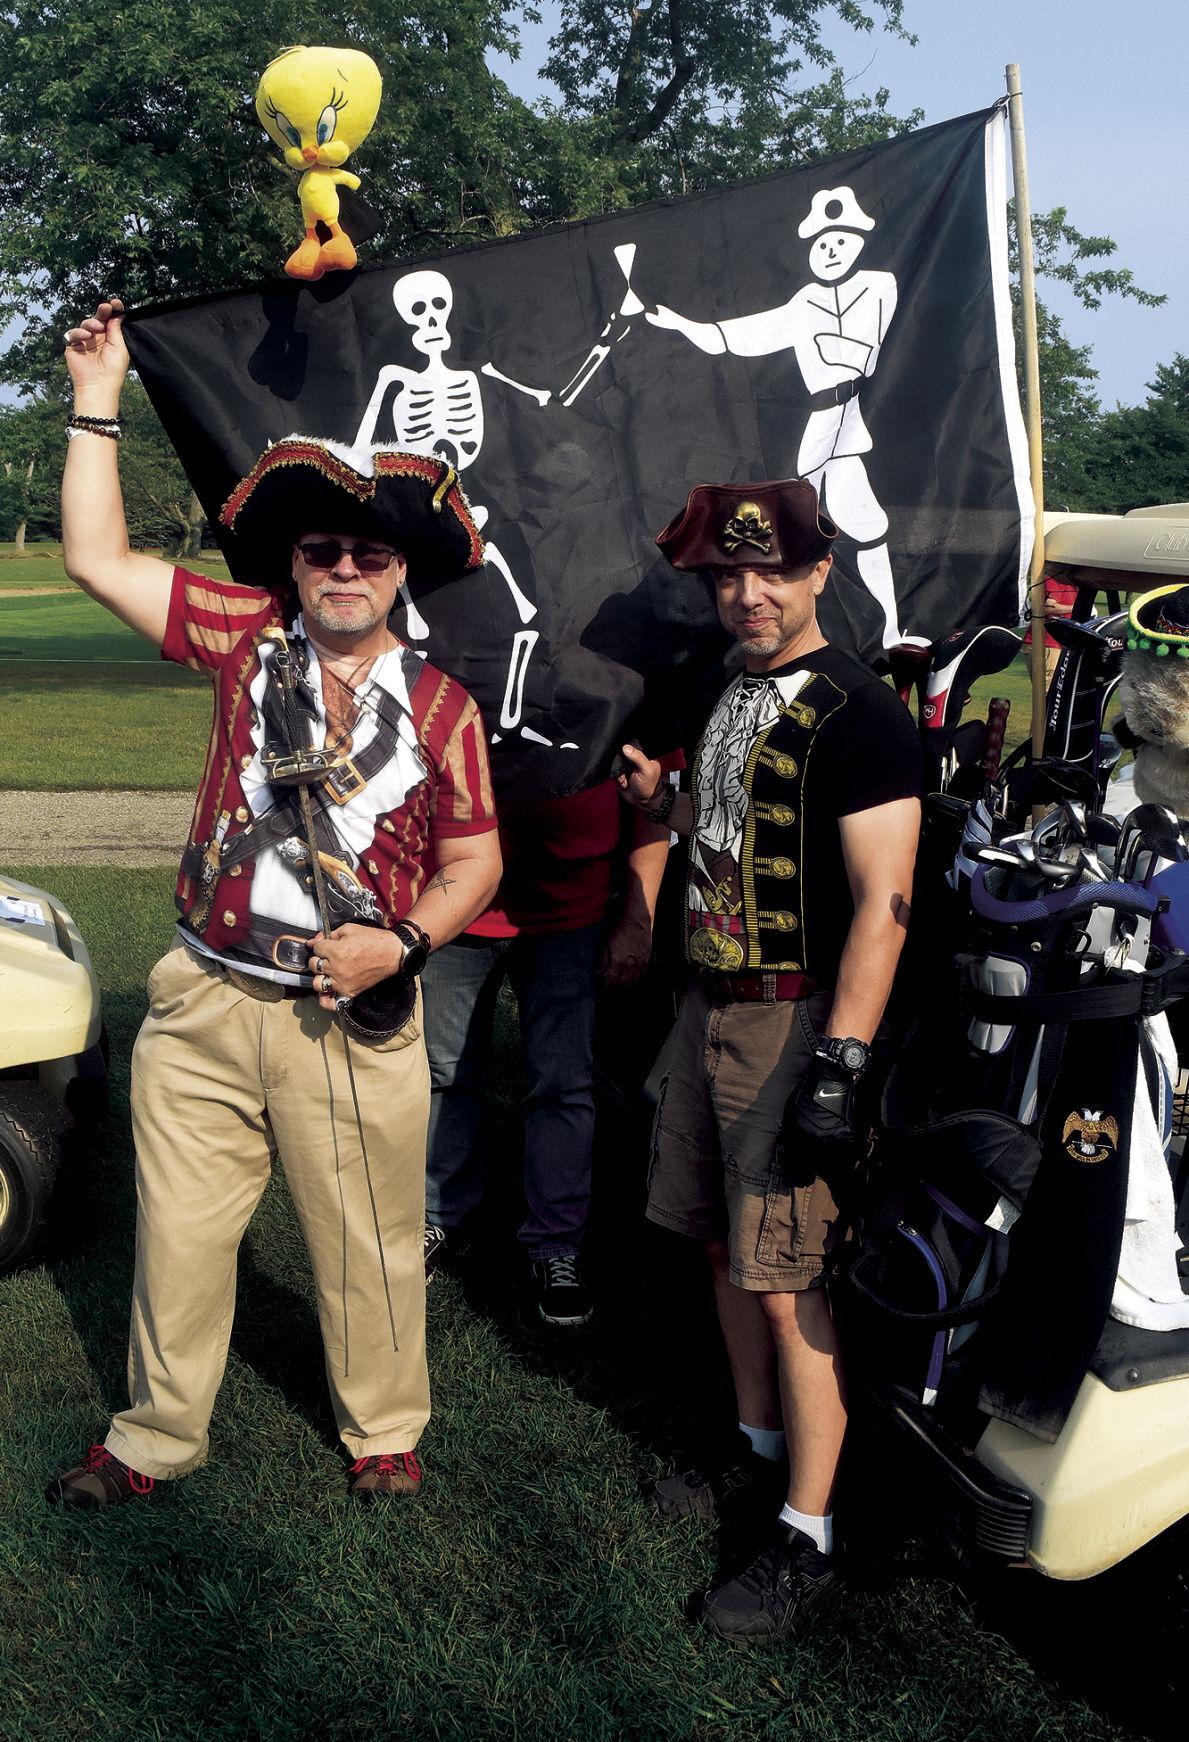 8 19 Bettys Golf 2 Pirates.jpg